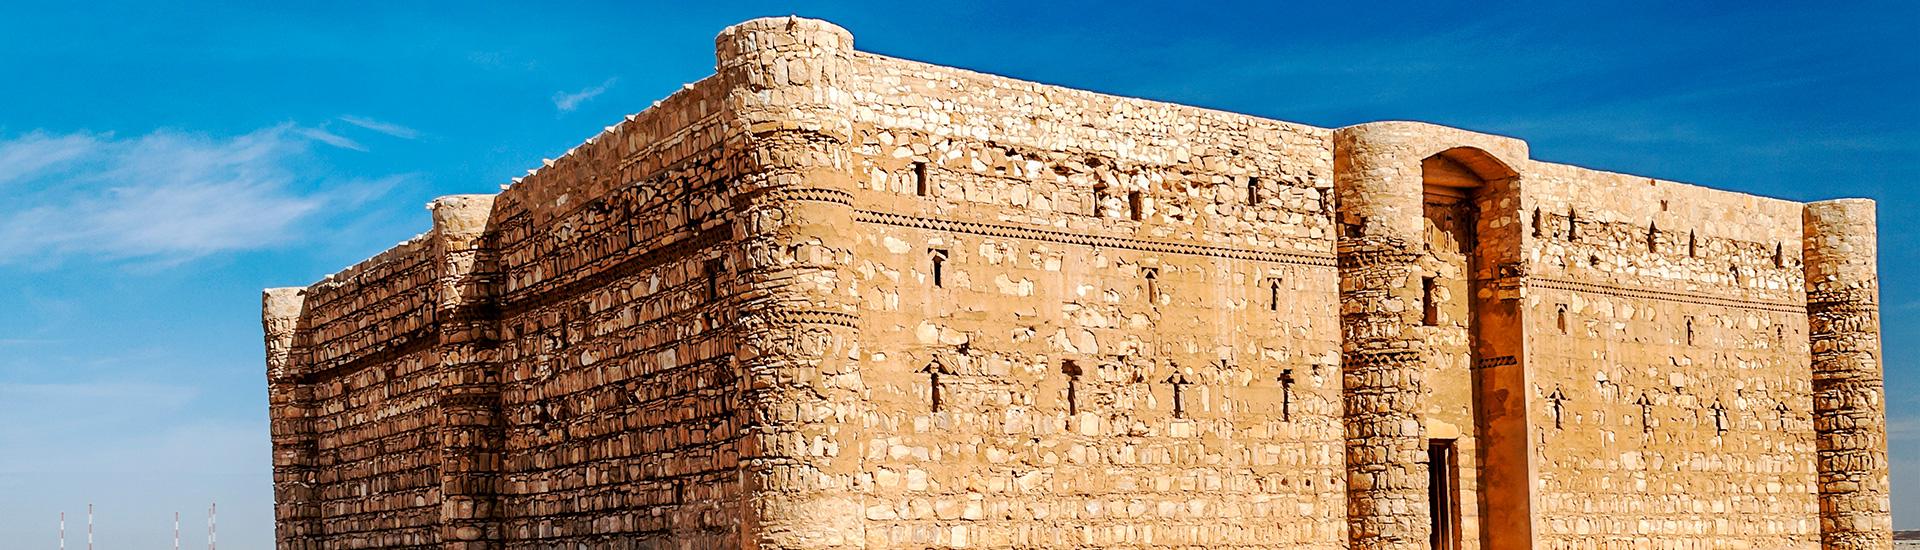 The rocky sites of Jordan are amazing.